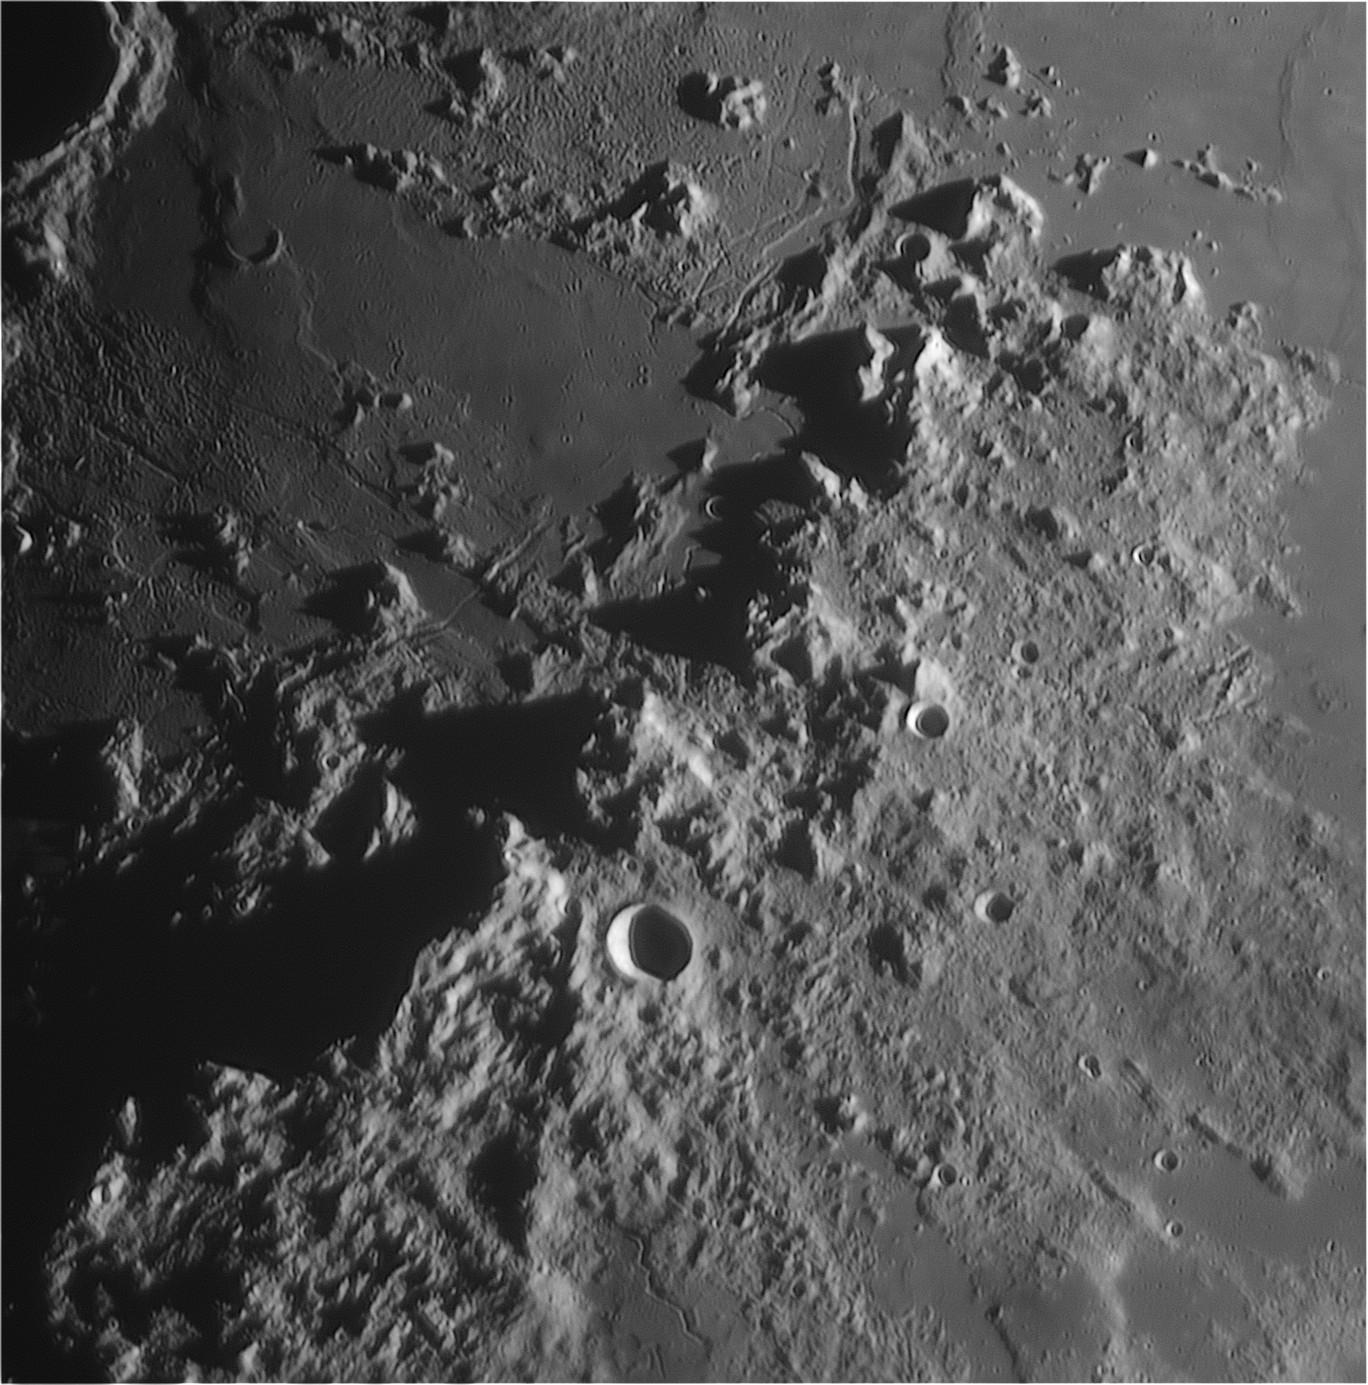 Moon_20190412_212431_23A.jpg